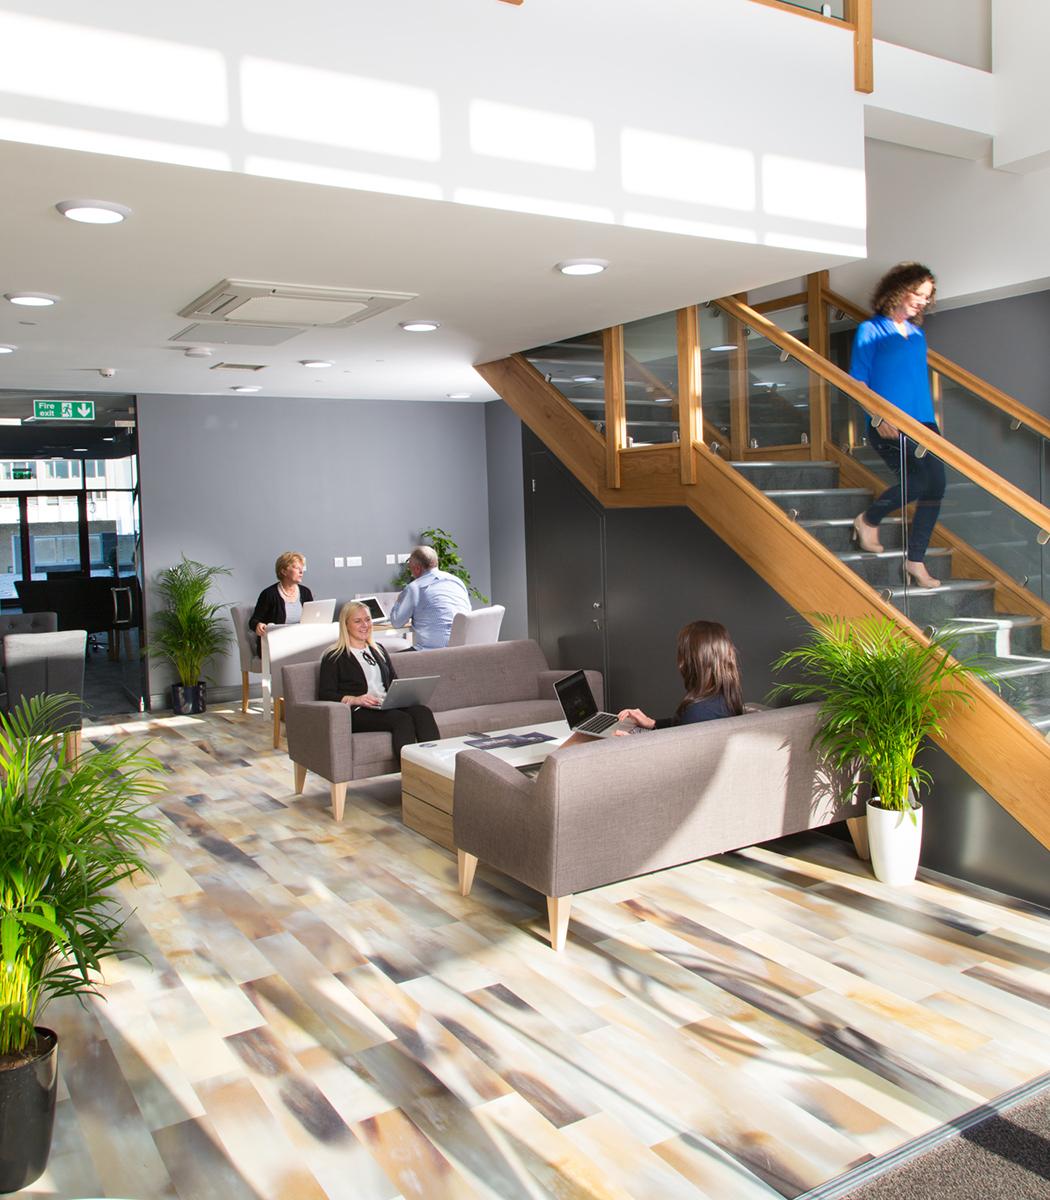 027 Interiors & Architectural